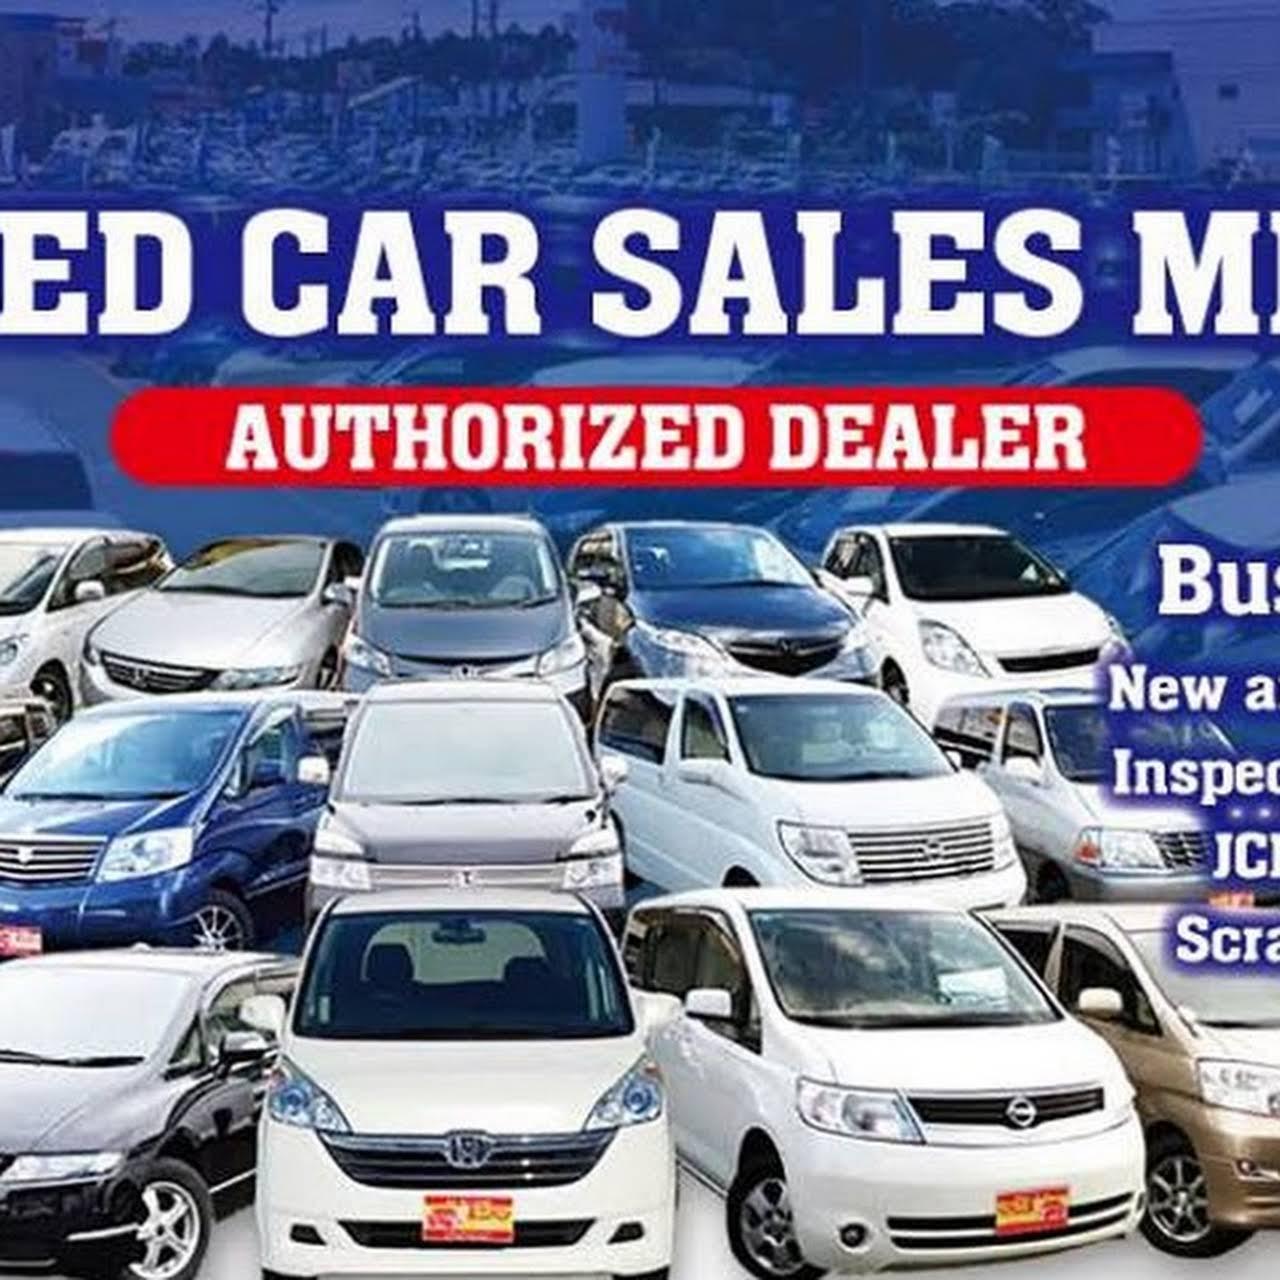 dk used car sales 自動車販売店